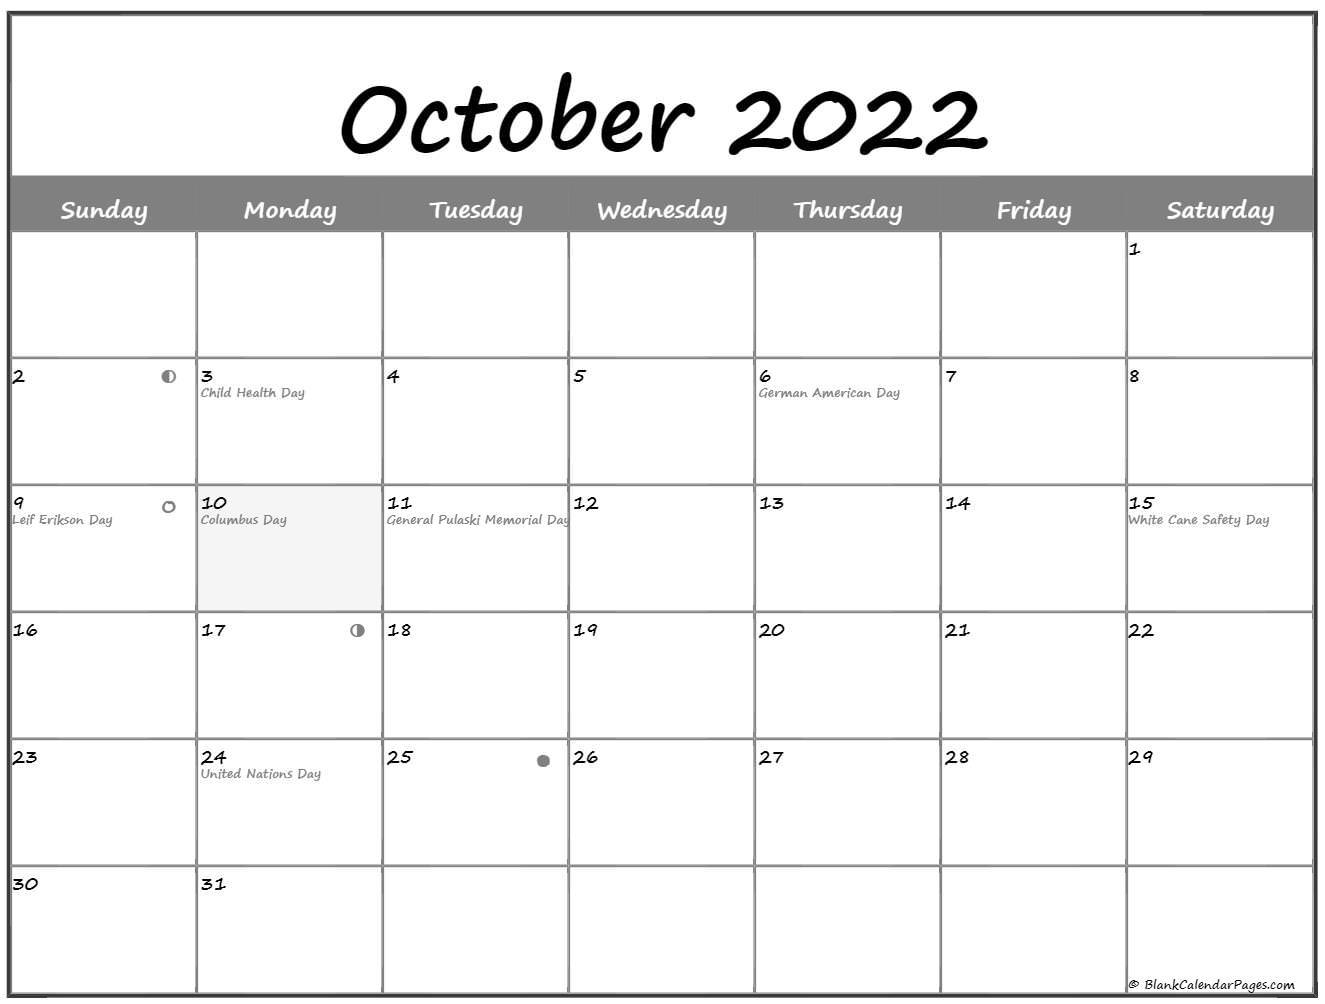 October 2022 Lunar Calendar | Moon Phase Calendar Intended For Calendar March April May June 2022